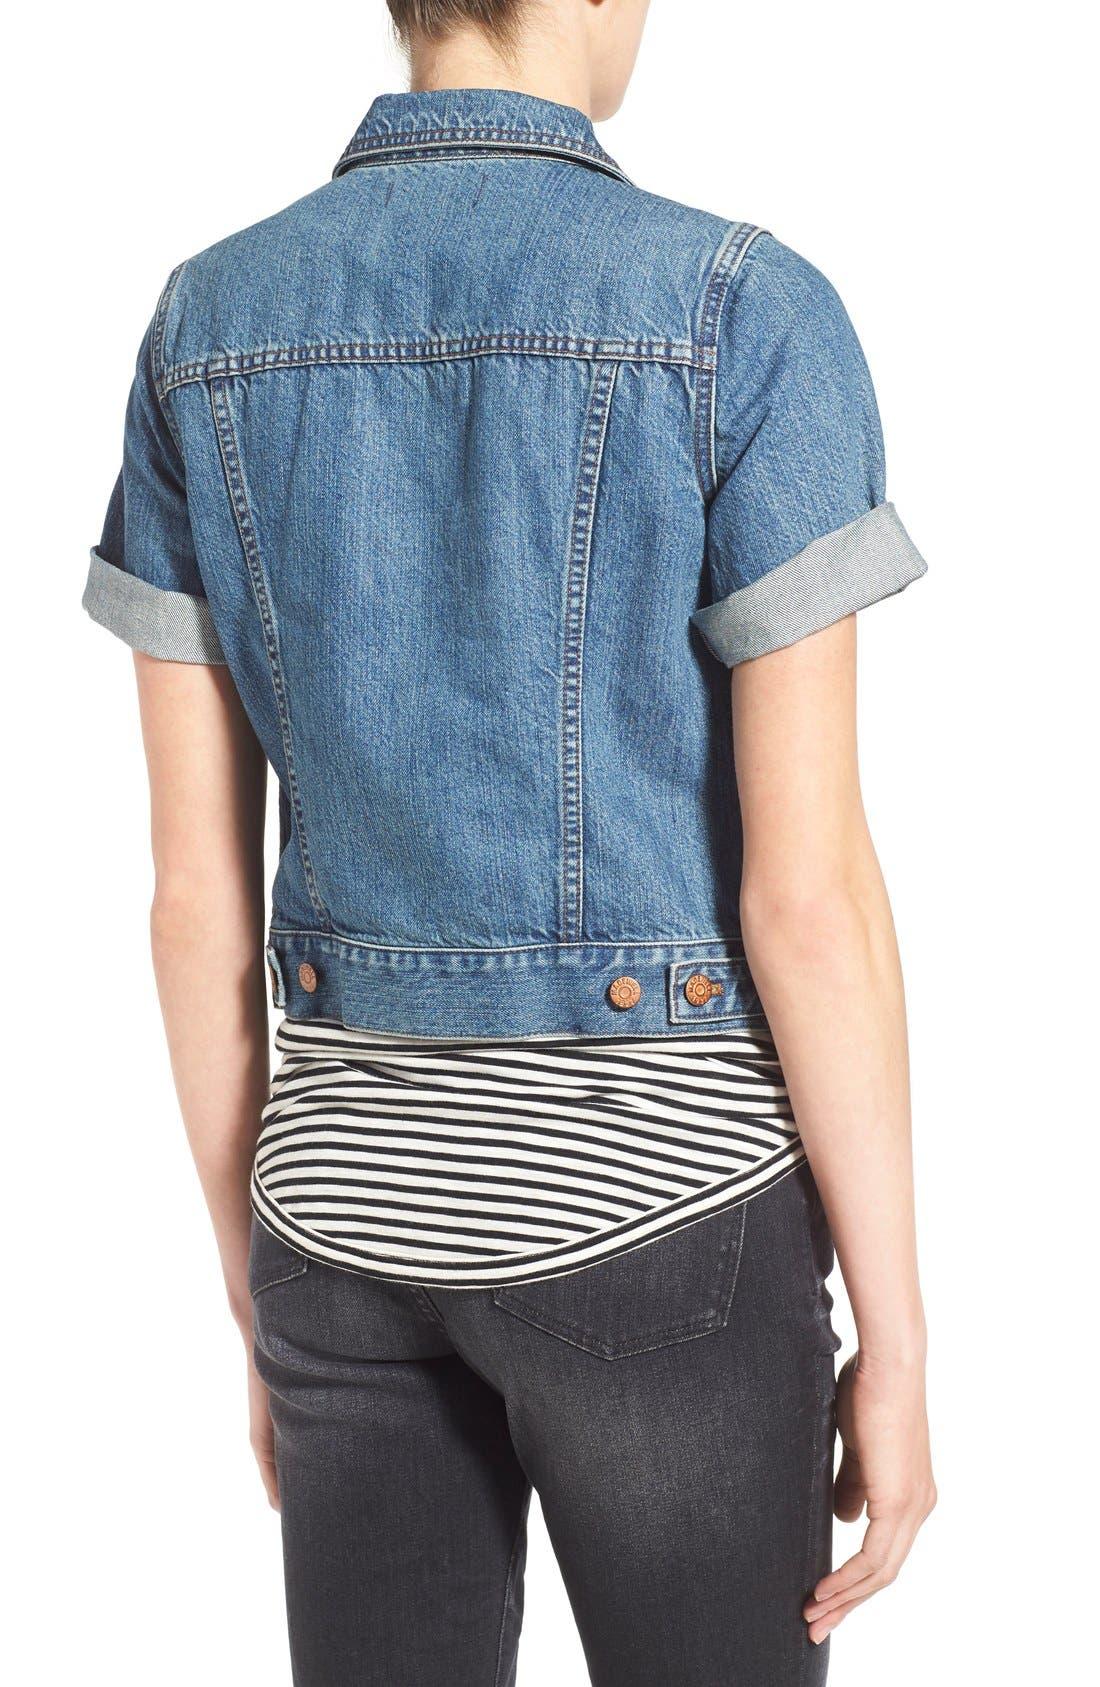 'Summer' Short Sleeve Denim Jacket,                             Alternate thumbnail 5, color,                             407